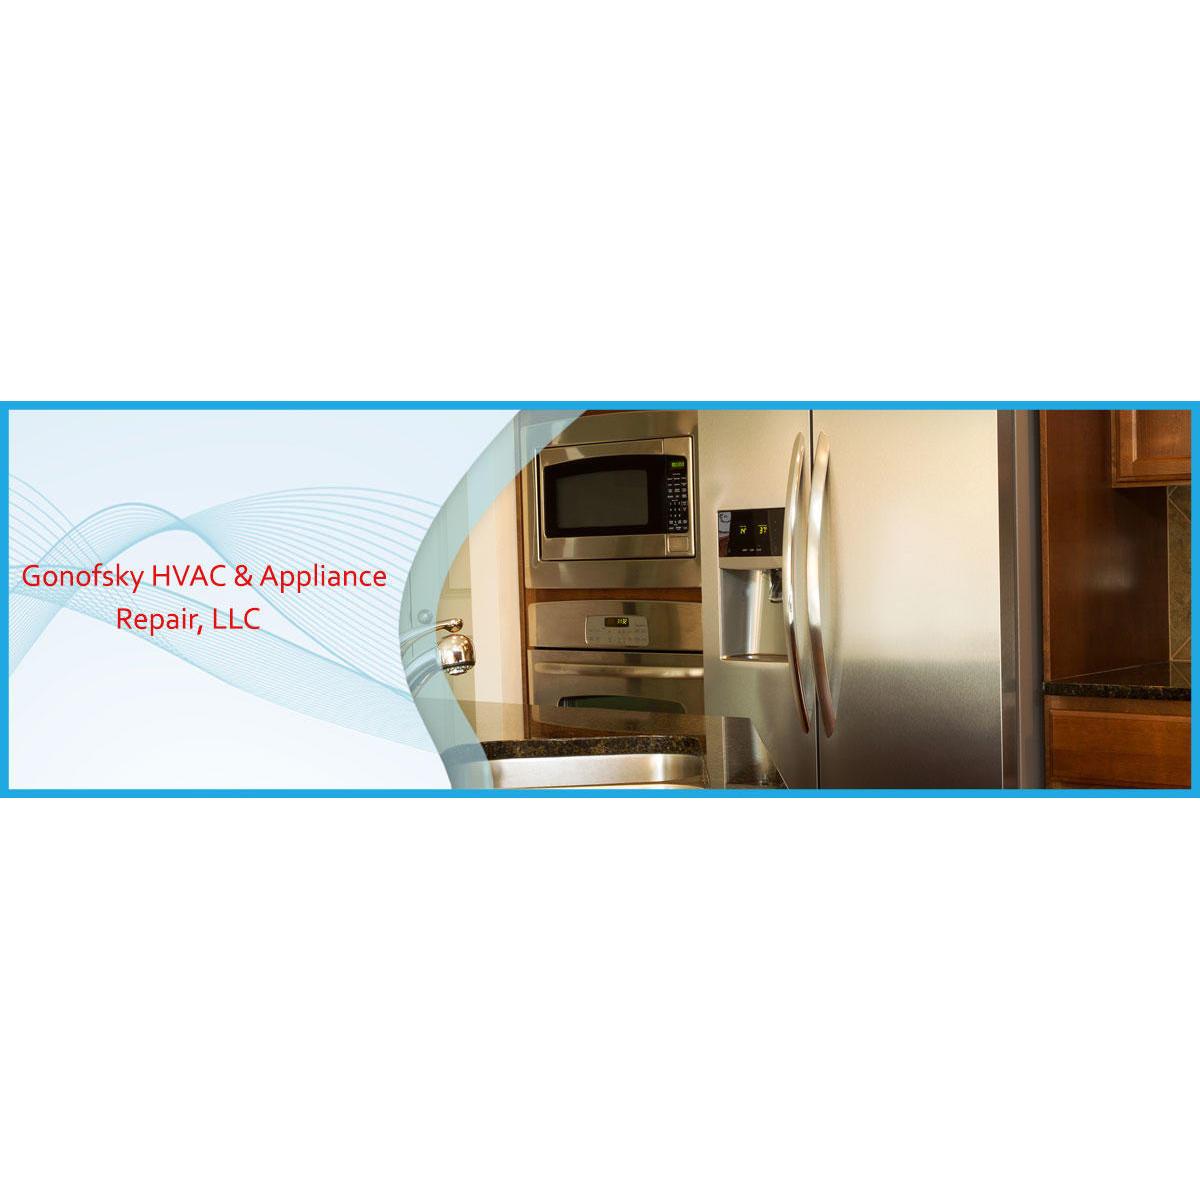 Gonofsky HVAC & Appliance Repair llc